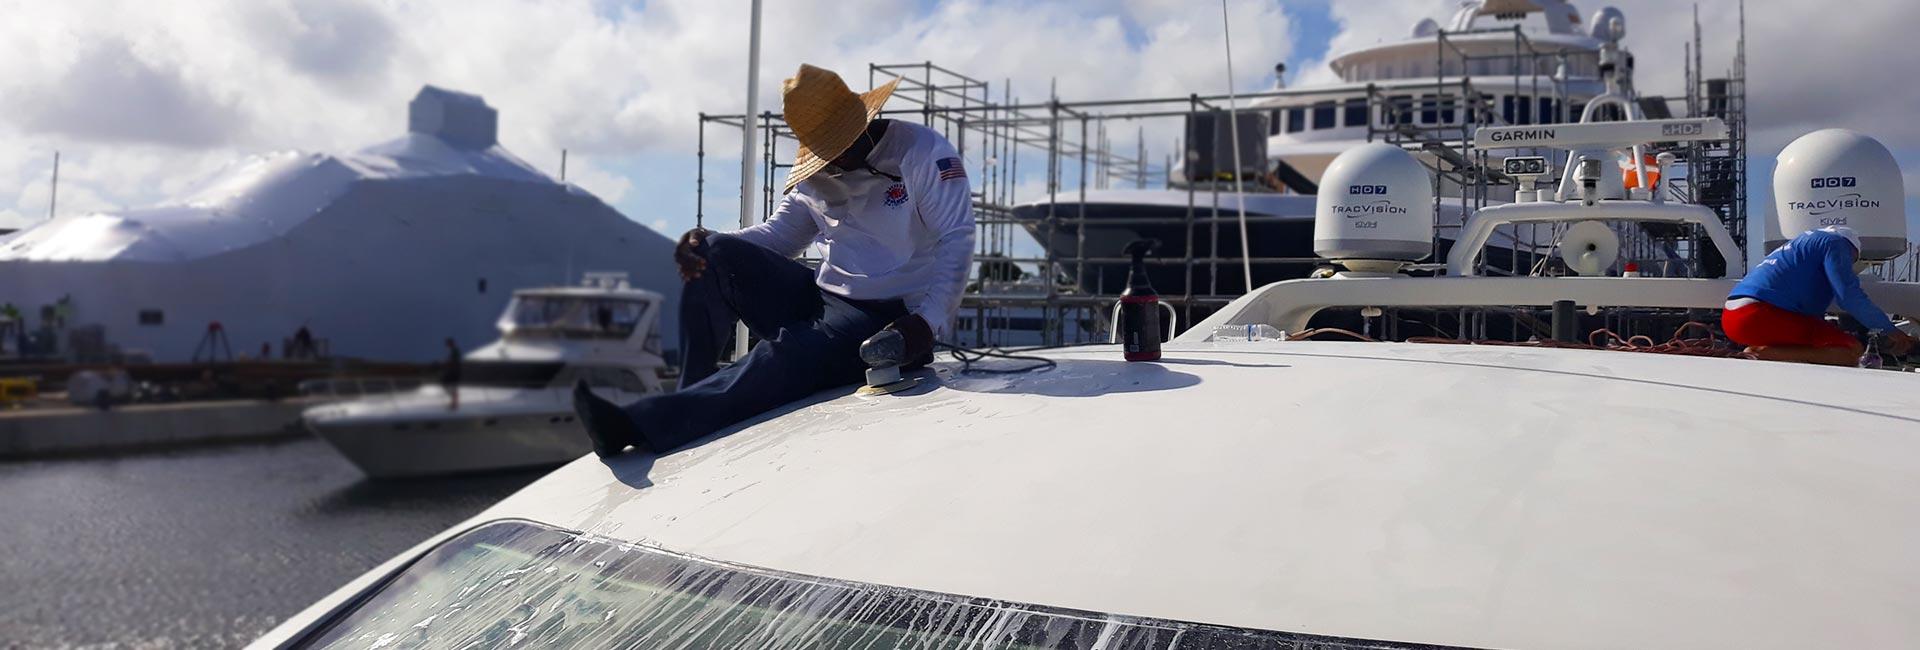 Fiberglass Repair in Key Biscayne, Pompano Beach, Fort Lauderdale, Hollywood